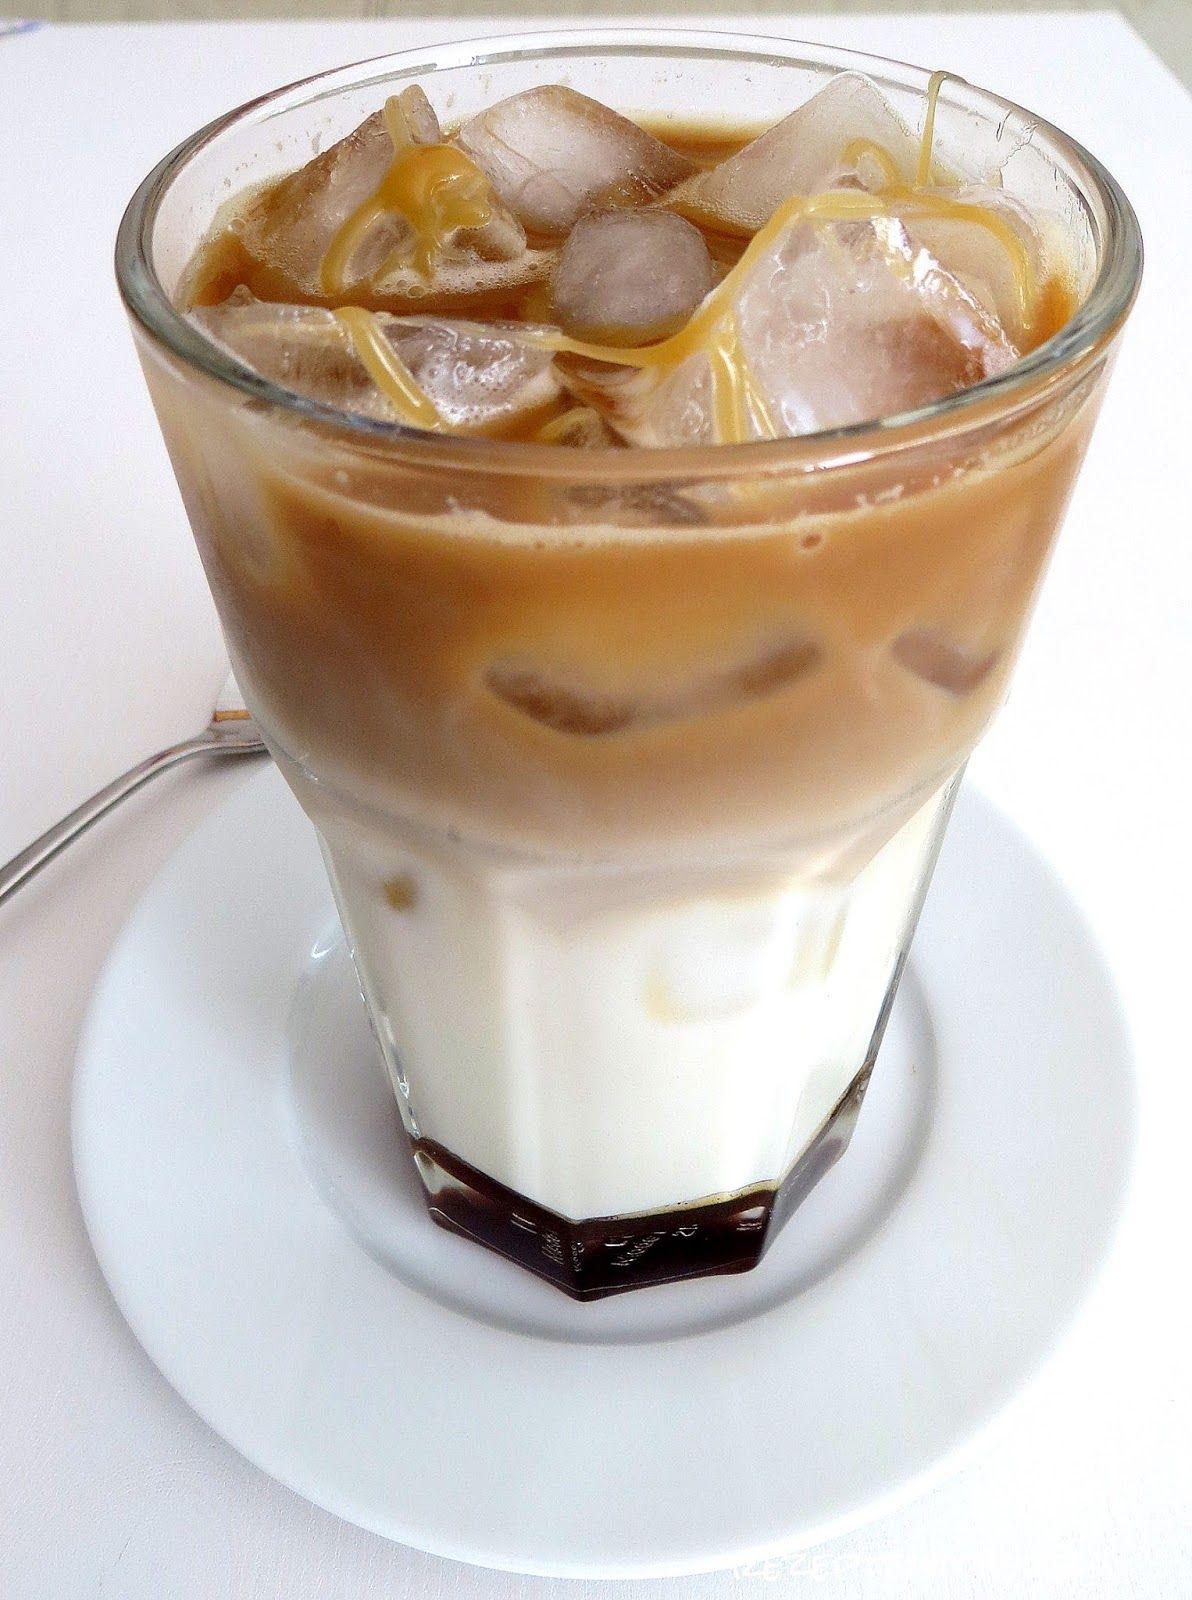 Rezepte mit Herz ♥: Iced Caramel Macchiato a la Starbucks ...